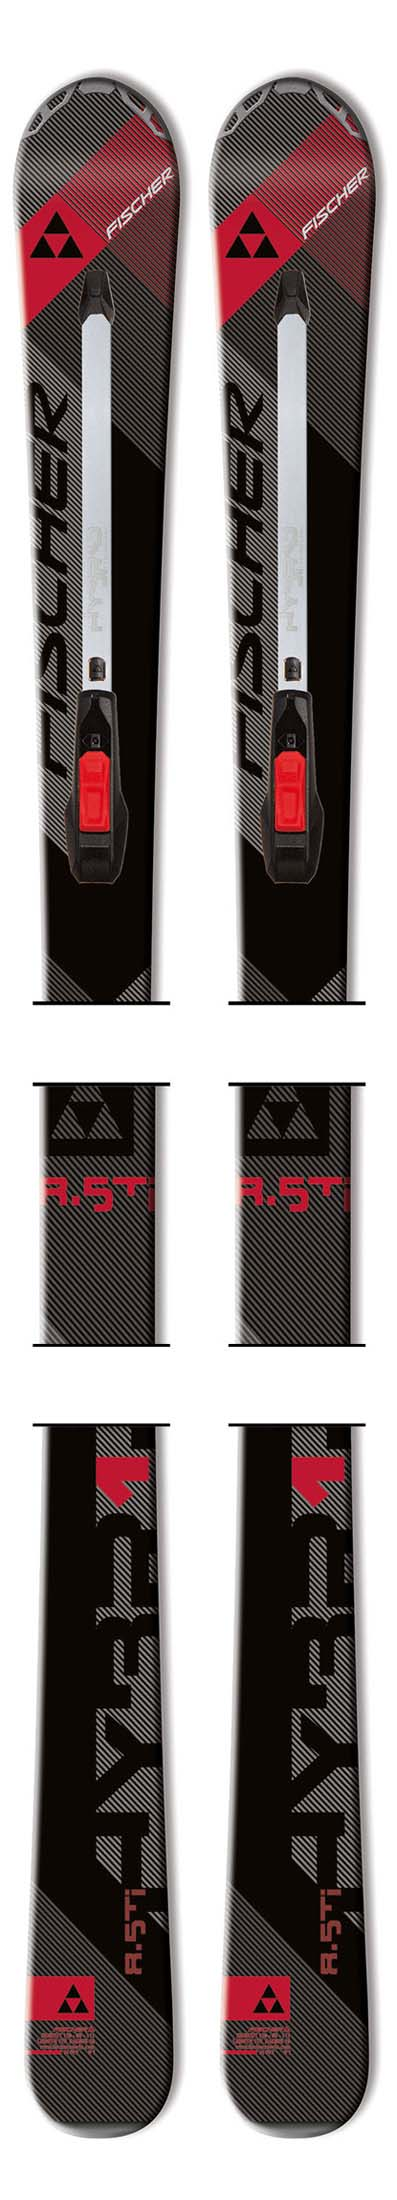 Fischer 13 - 14 Hybrid 8.5 Ti Skis (No Bindings / Flat) NEW !!  175cm